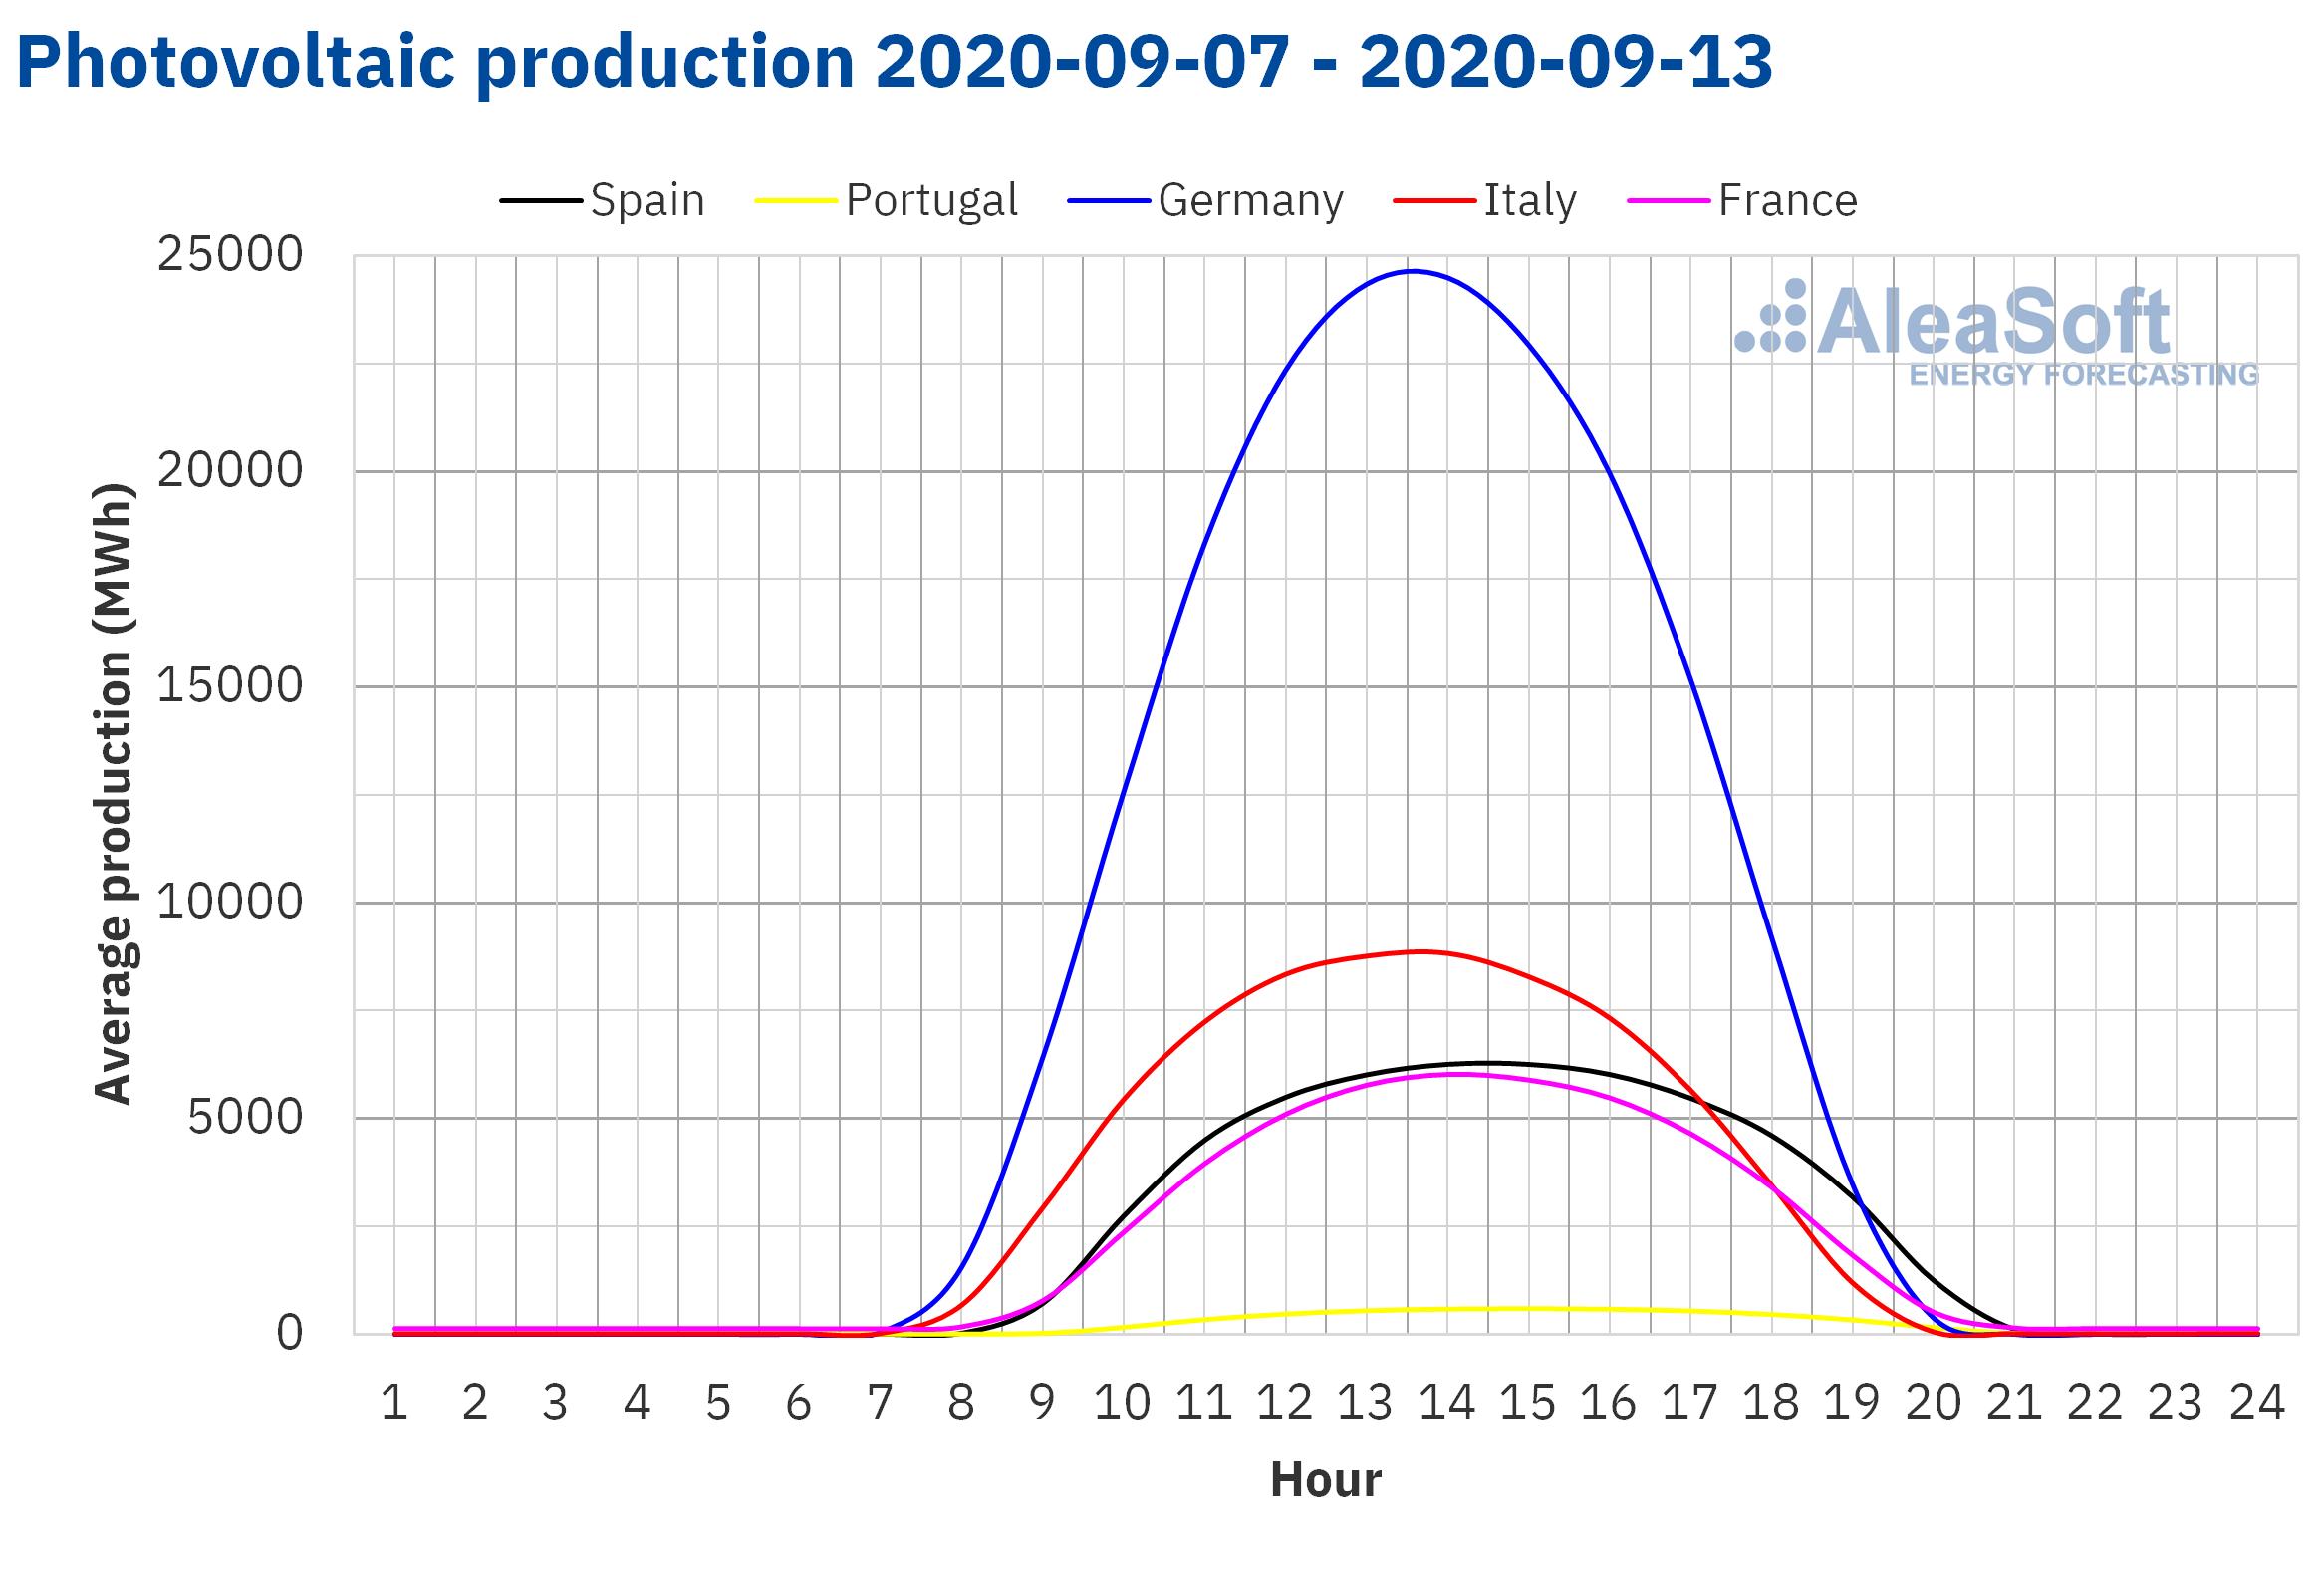 AleaSoft - Solar photovoltaic production profile of Europe